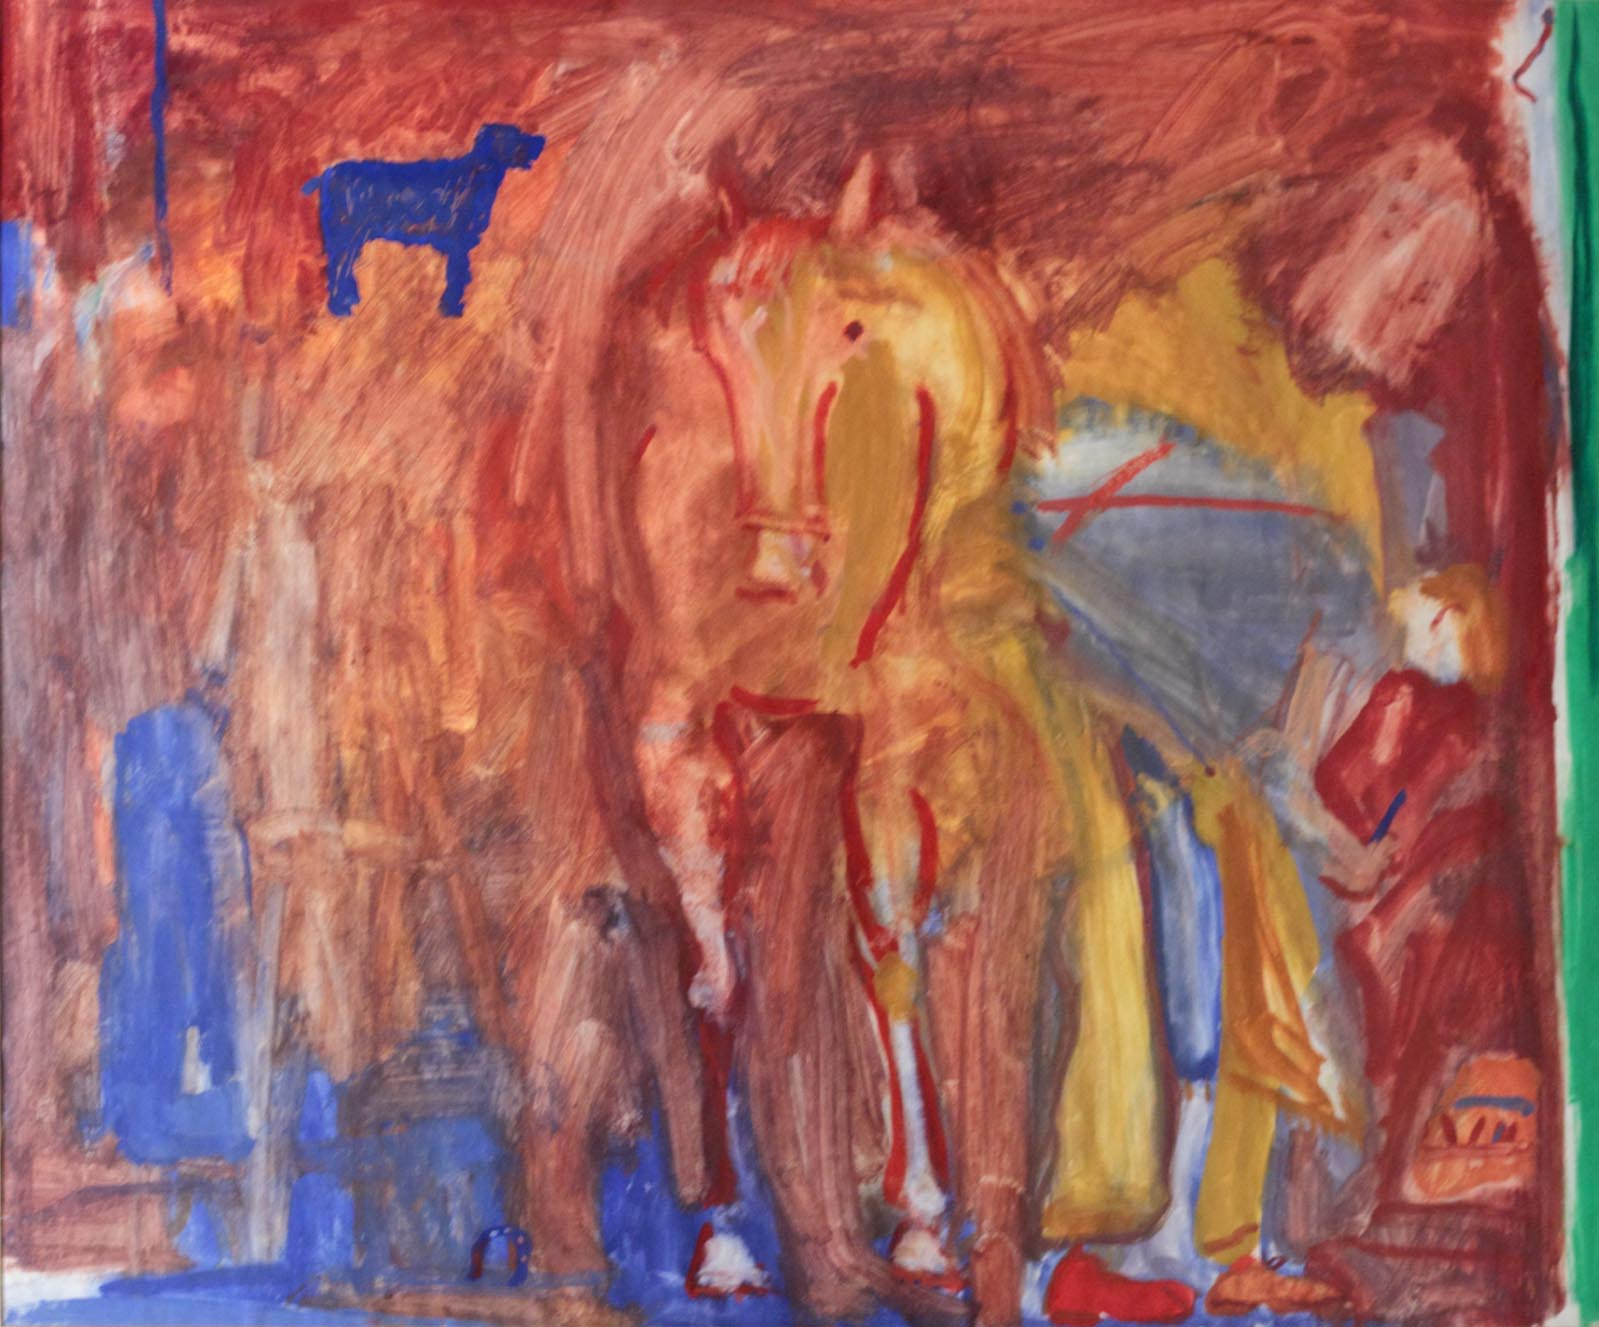 Ben Hartley Blacksmith Gesso on Paper 56 x 69 cm.